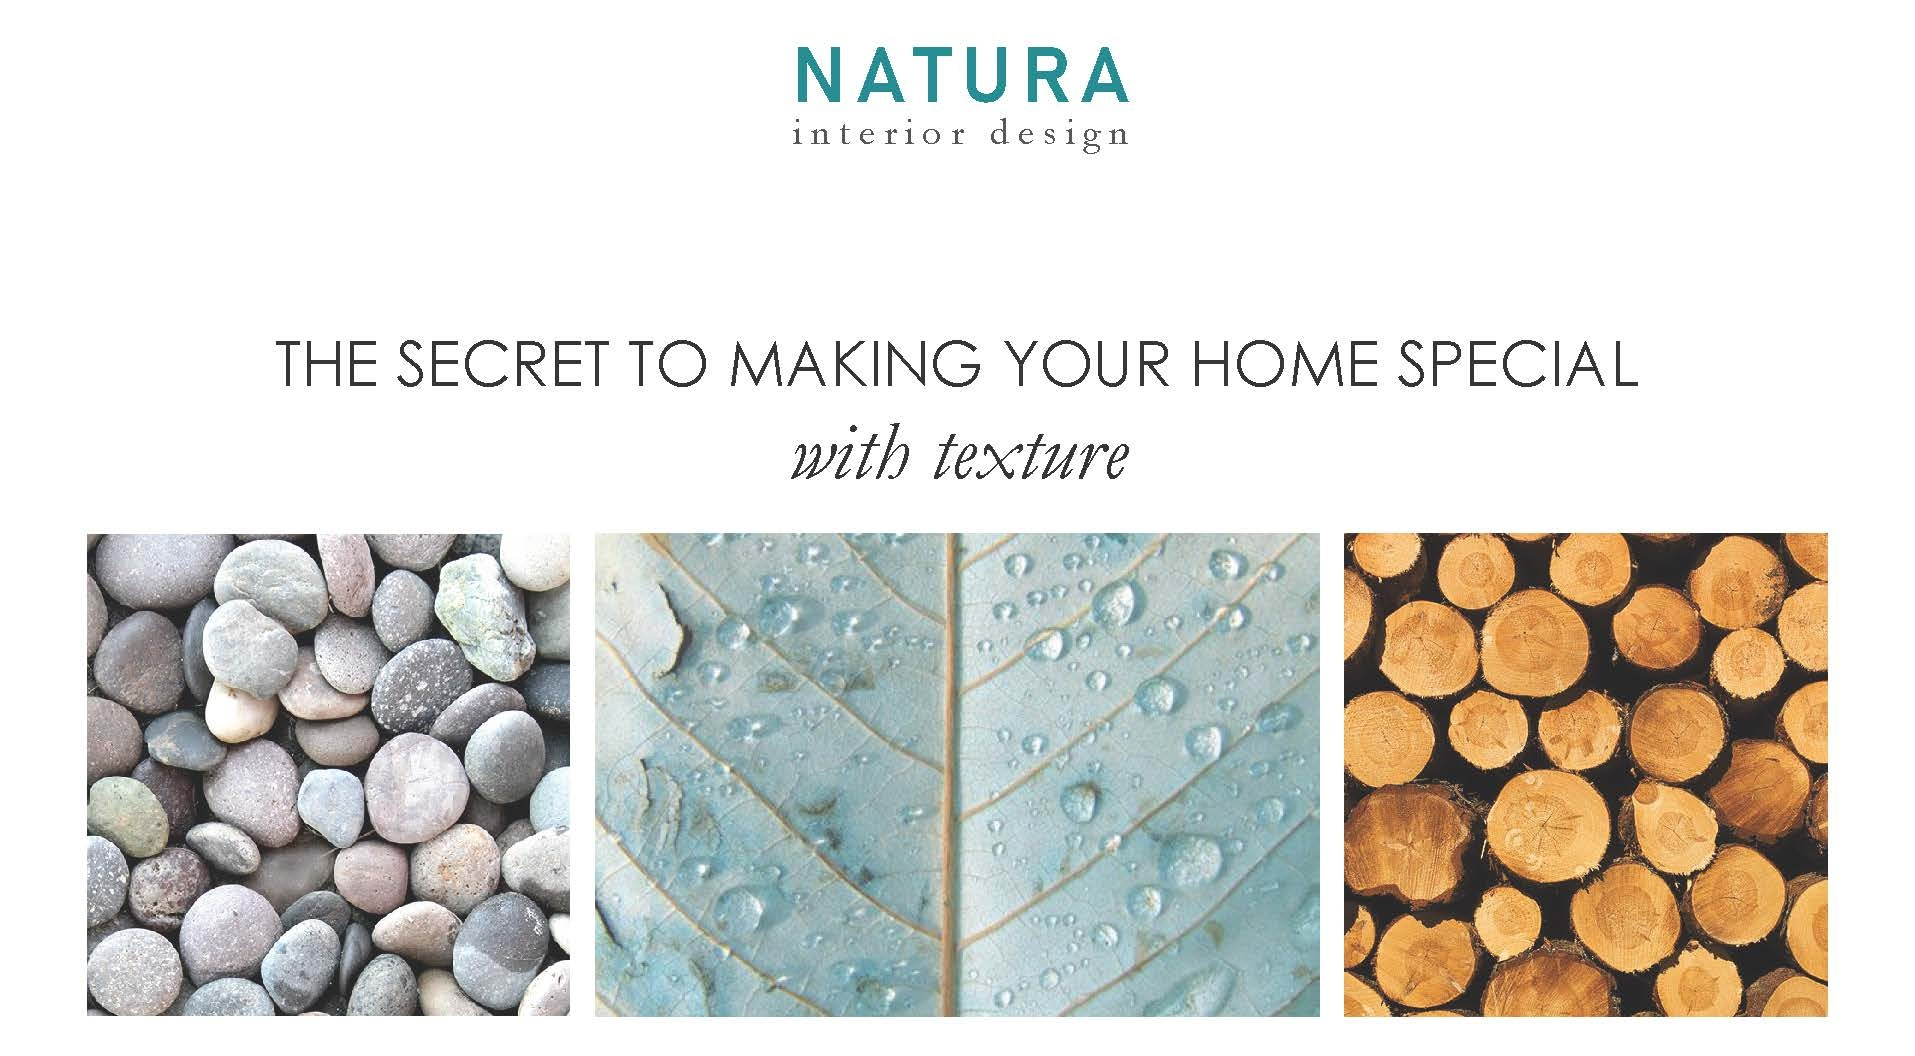 Texture-e-workbook-Natura_Page_1.jpg